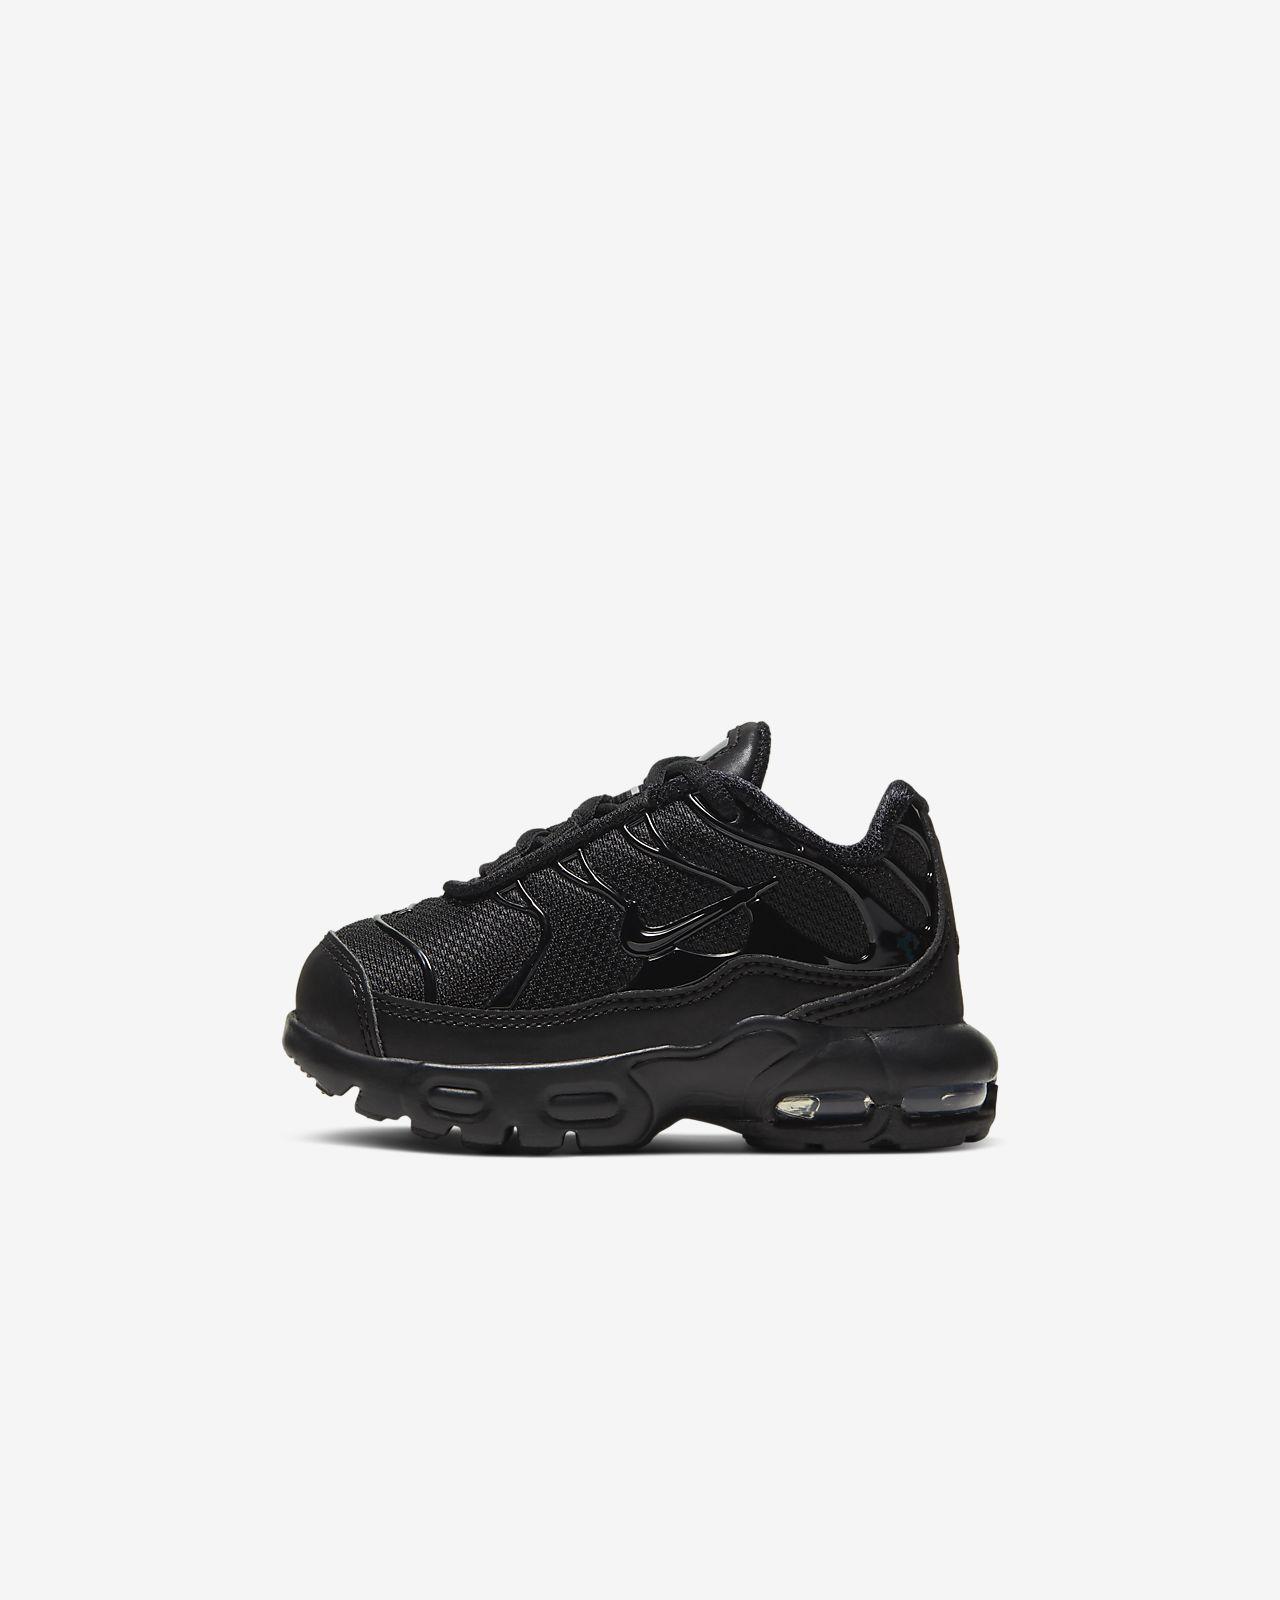 Buty dla niemowląt / maluchów Nike Air Max Plus